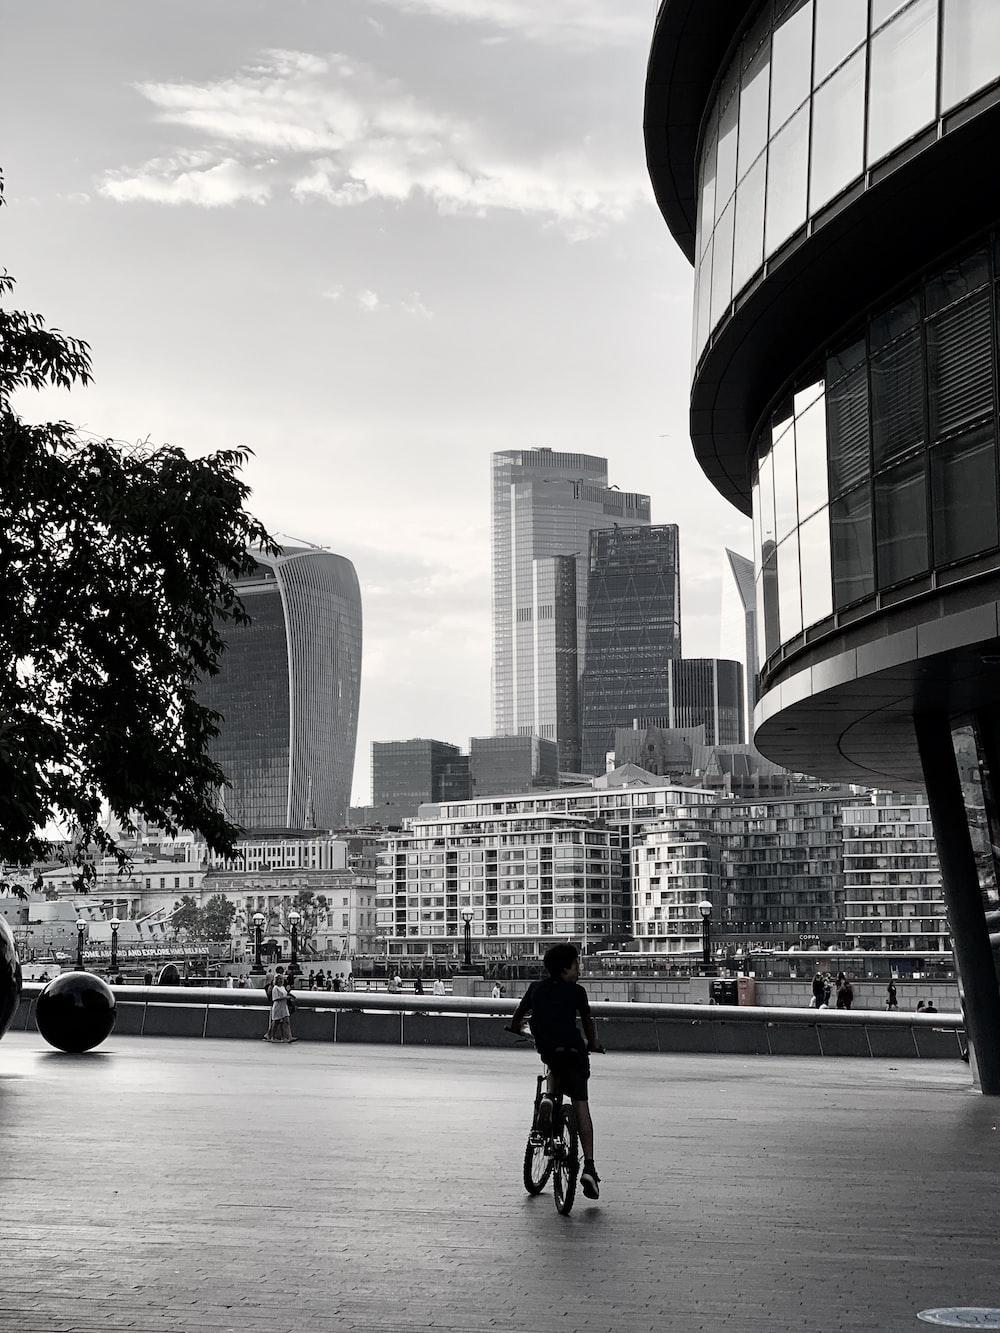 man in black jacket walking on sidewalk near city buildings during daytime